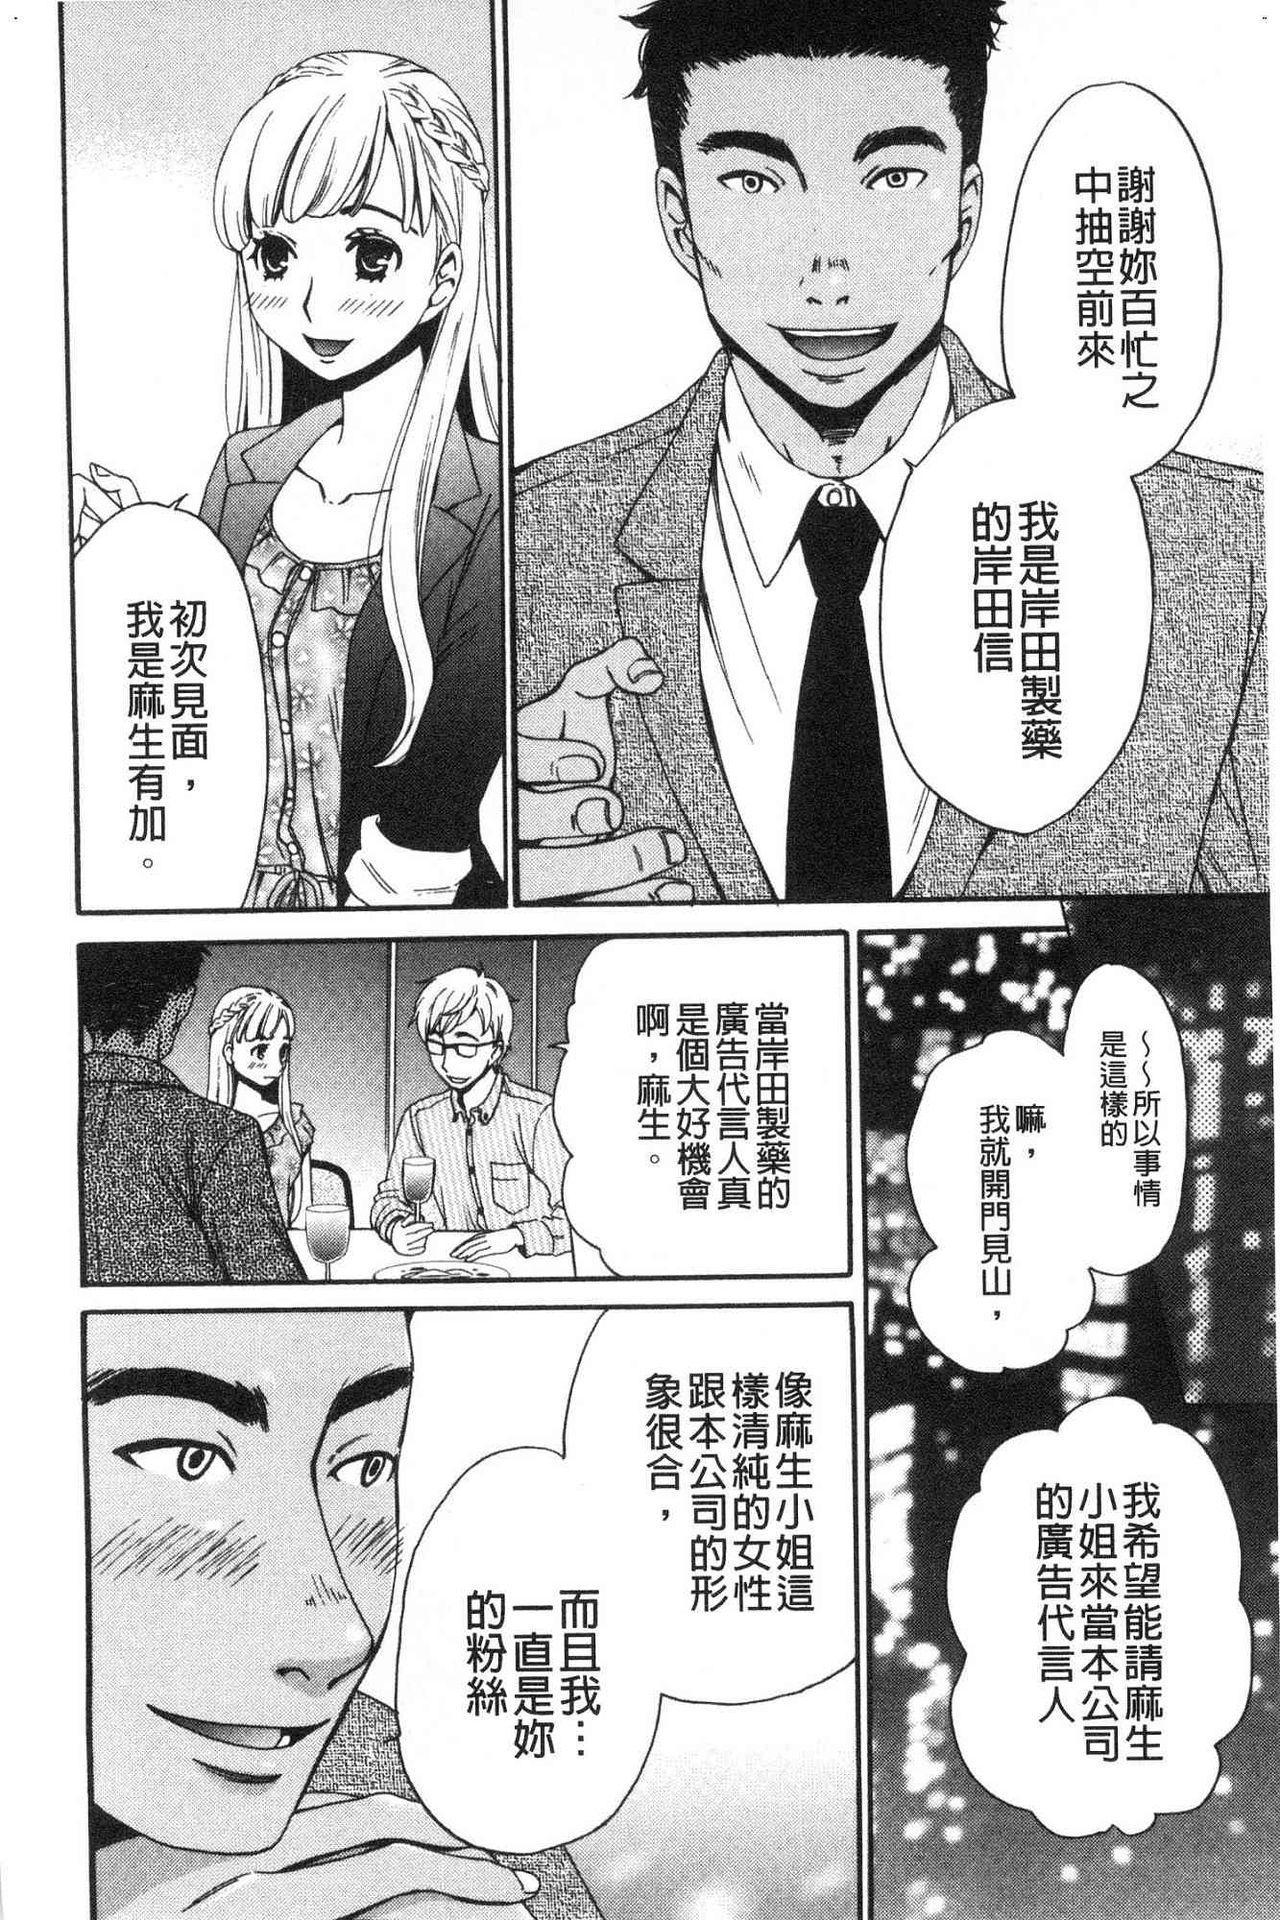 [Gotoh Akira]  21-ji no Onna ~Camera no Mae no Mesuinu~ 2 | 21時之女 ~鏡頭前的牝犬~ 2 [Chinese] 7